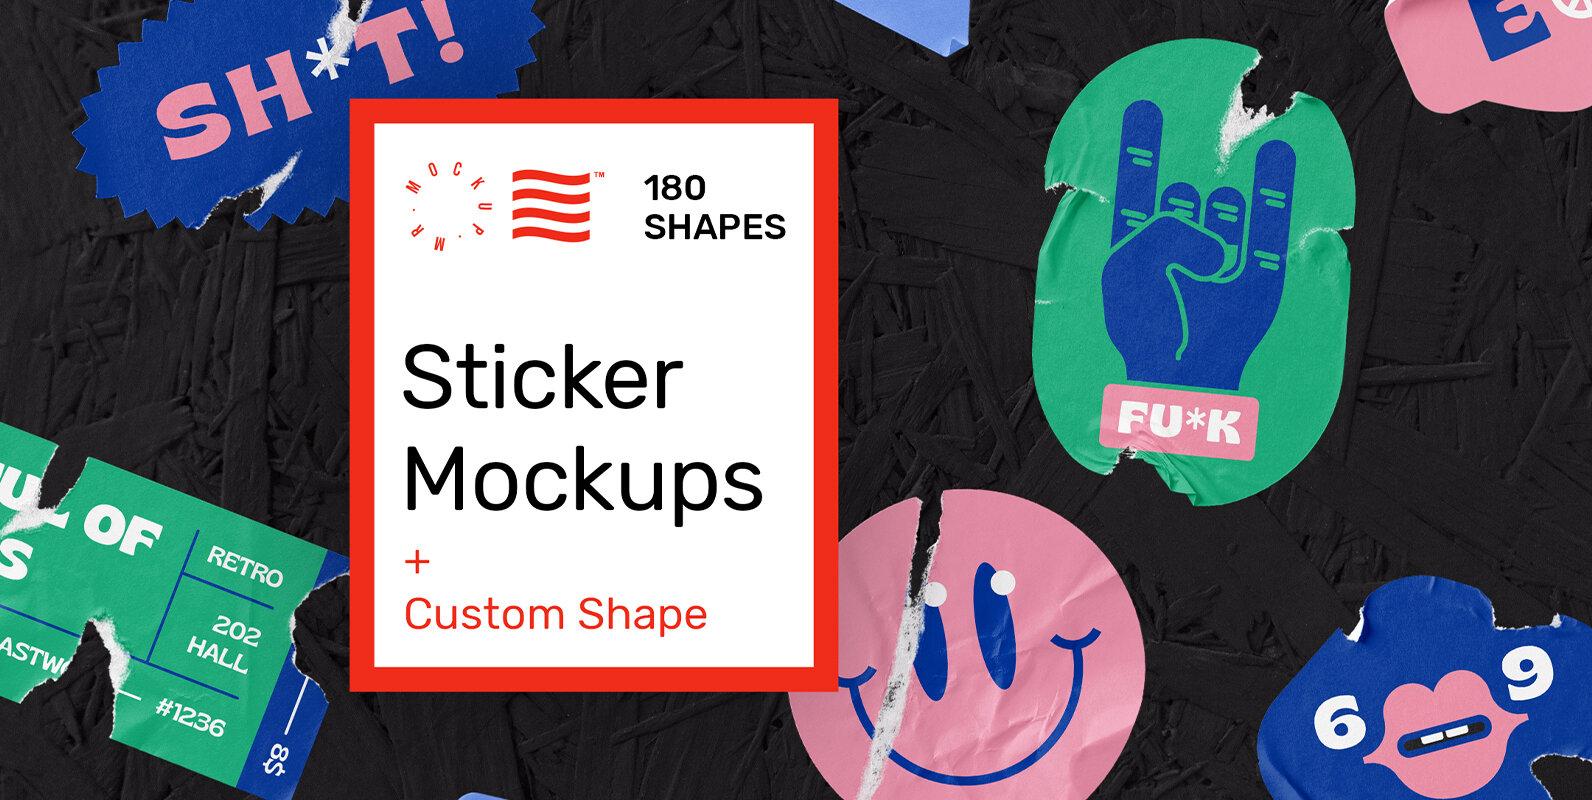 Sticker Mockups - Shape Generator